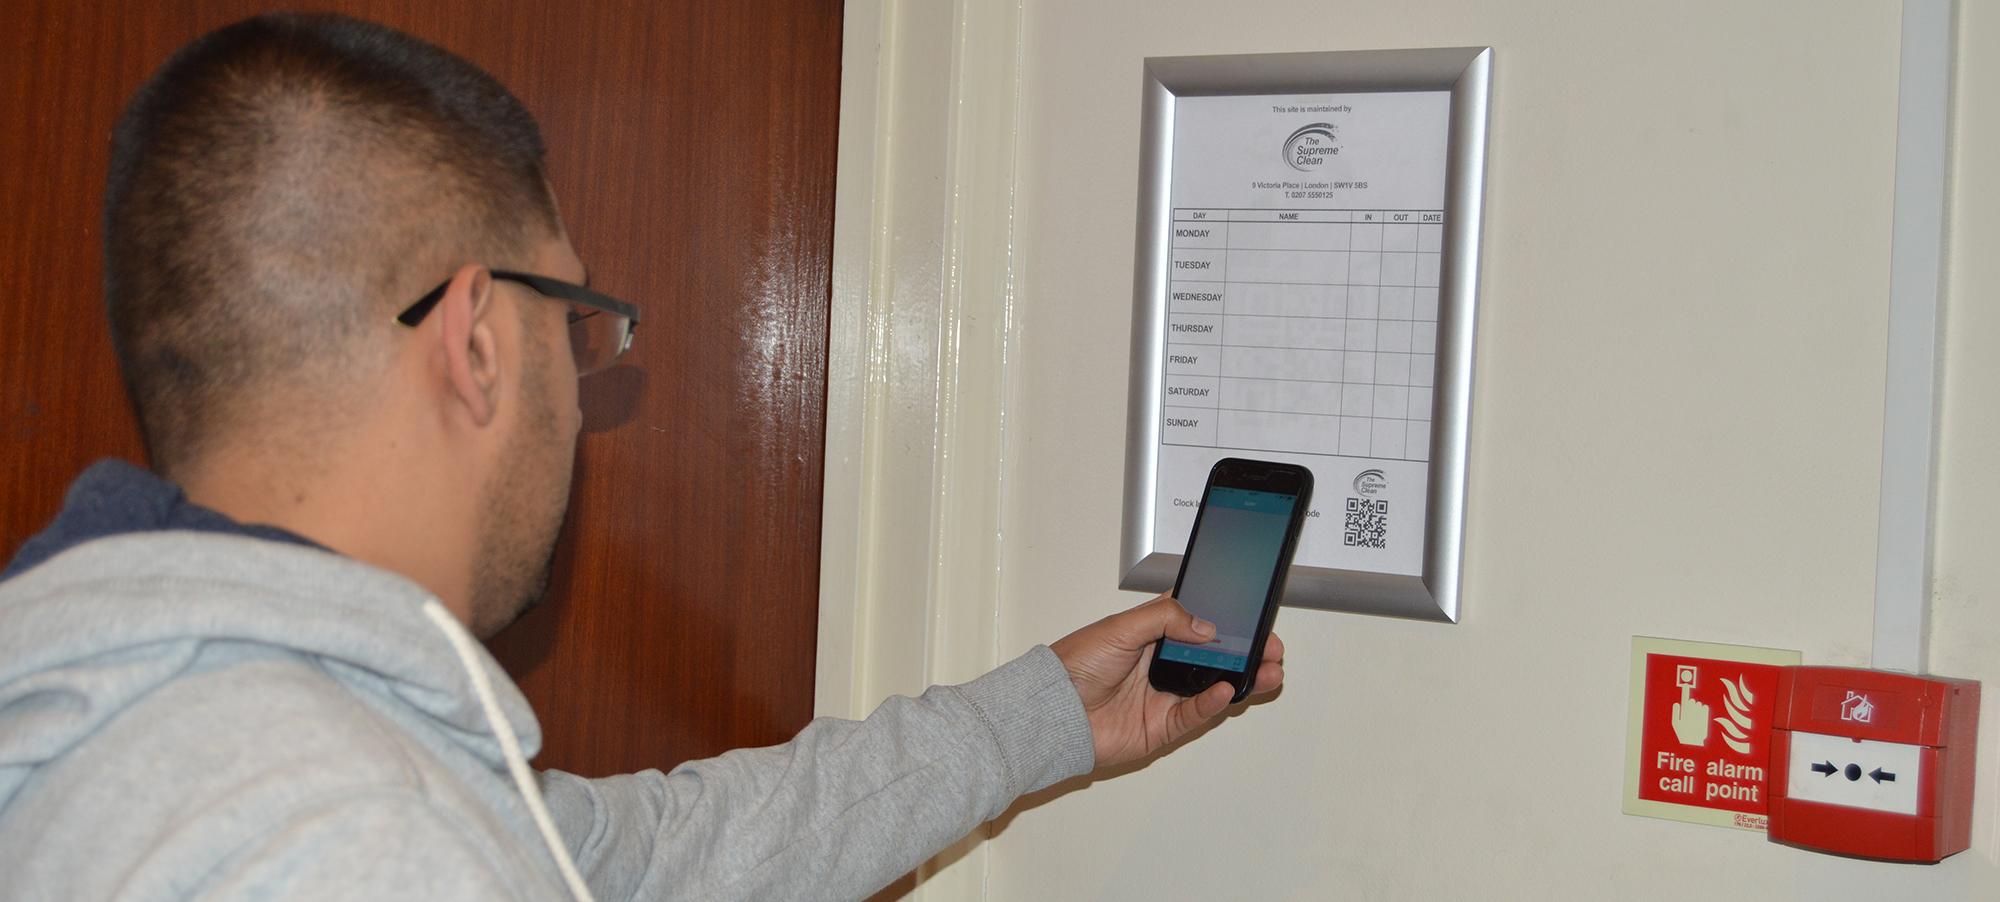 Cleaning Staff Software - Smart Clockin